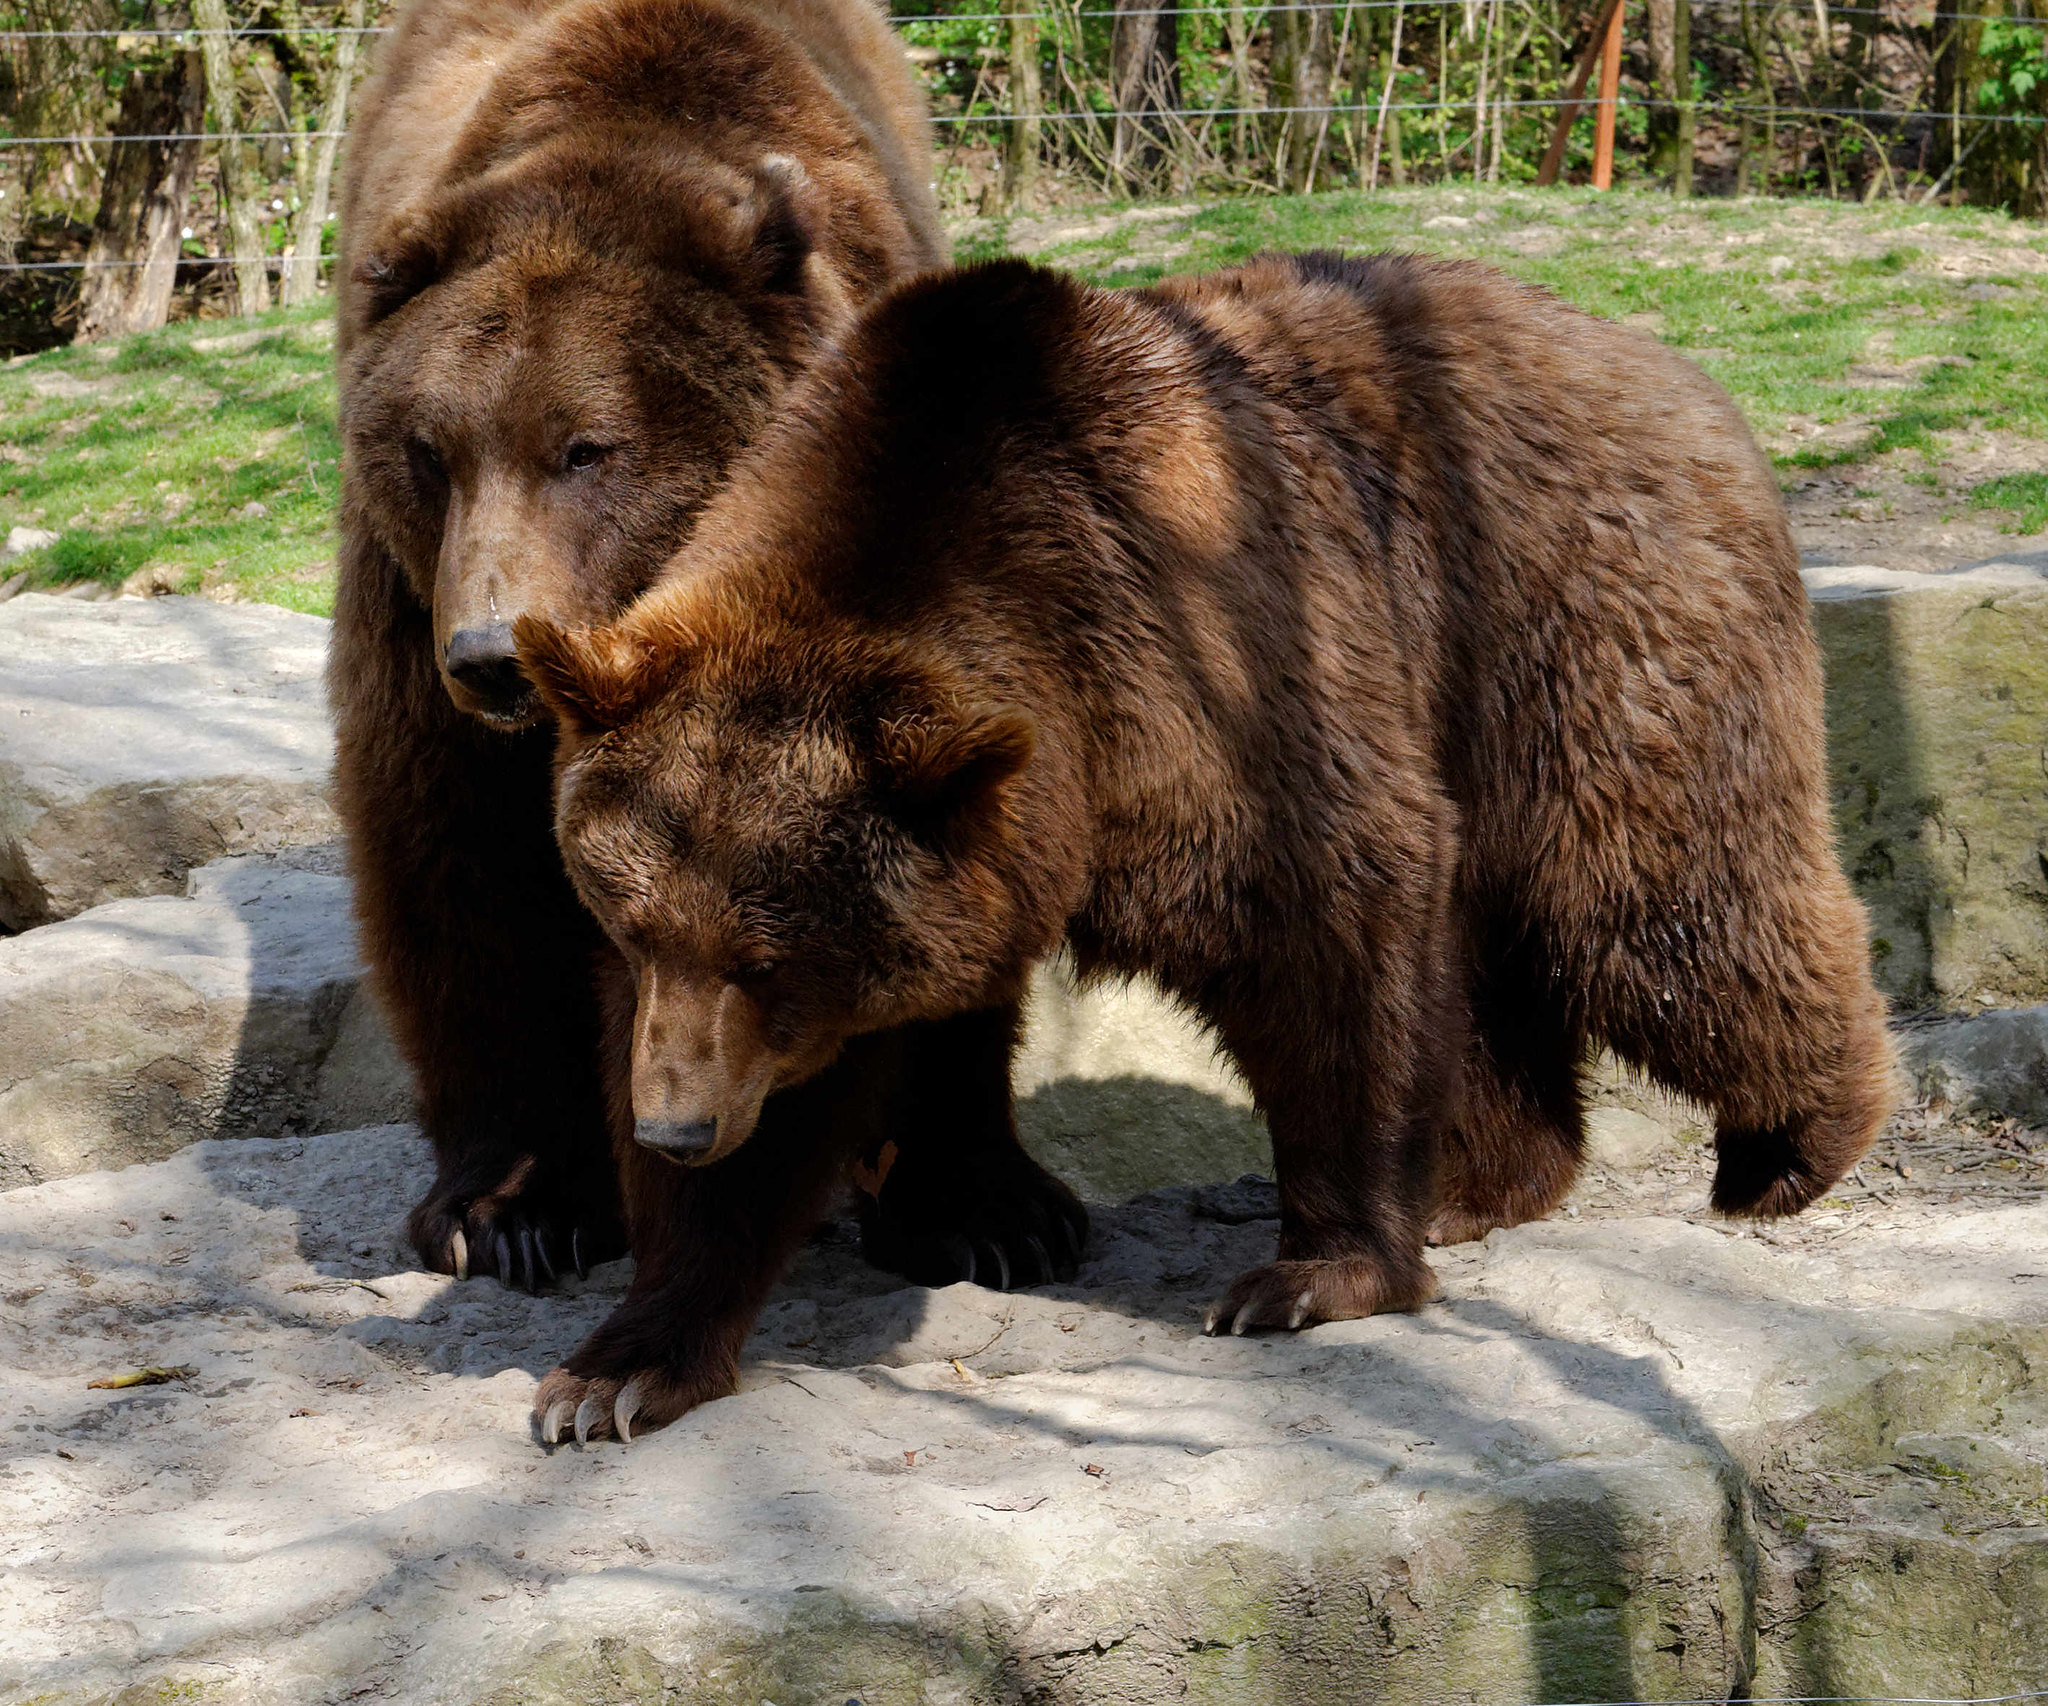 Schmusebären